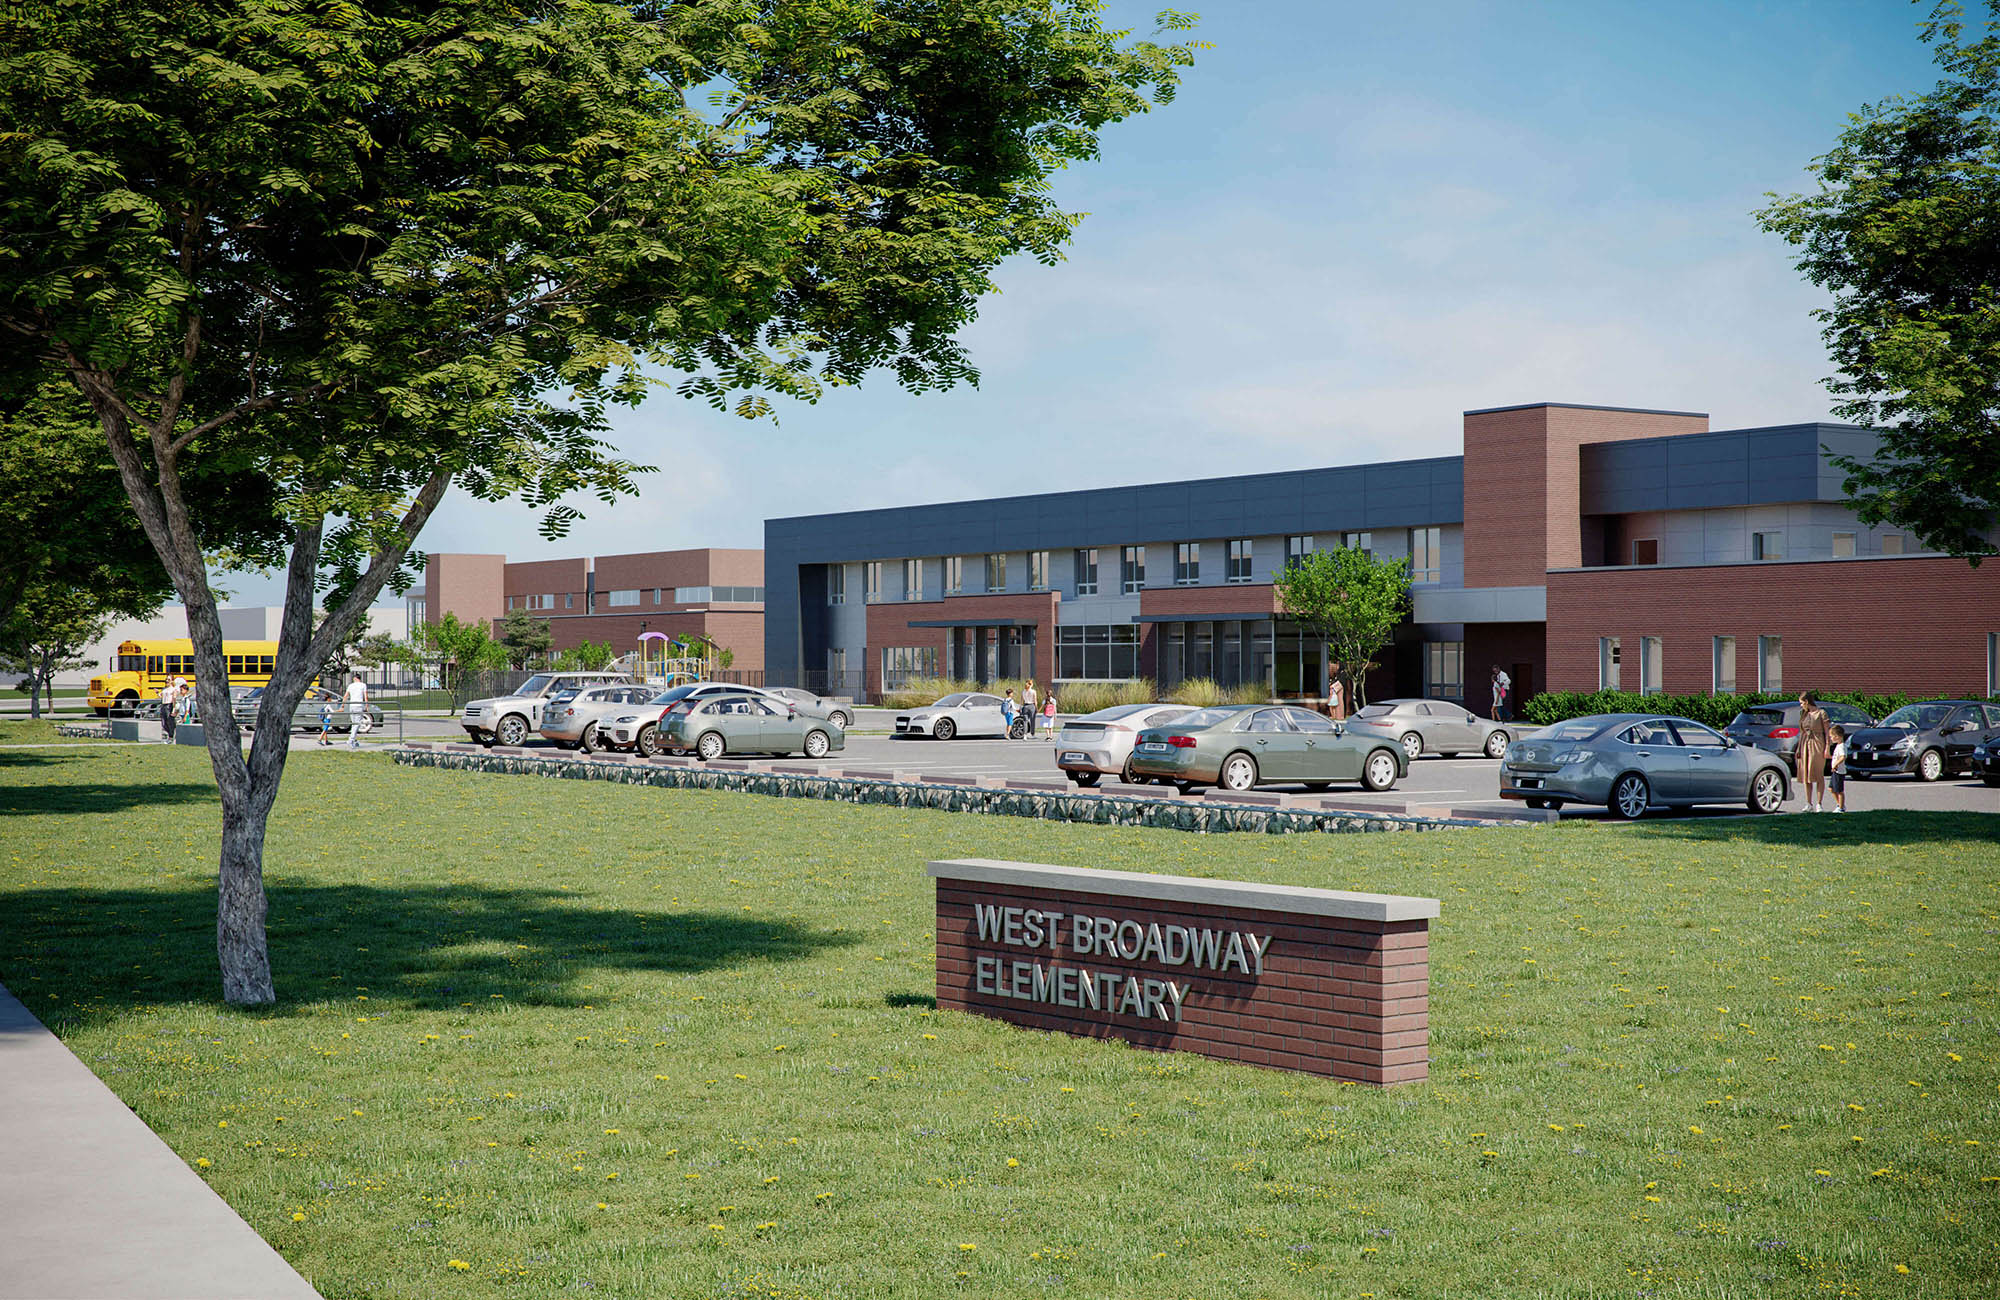 JCPS-WestBroadwayElementarySchool-entrance2